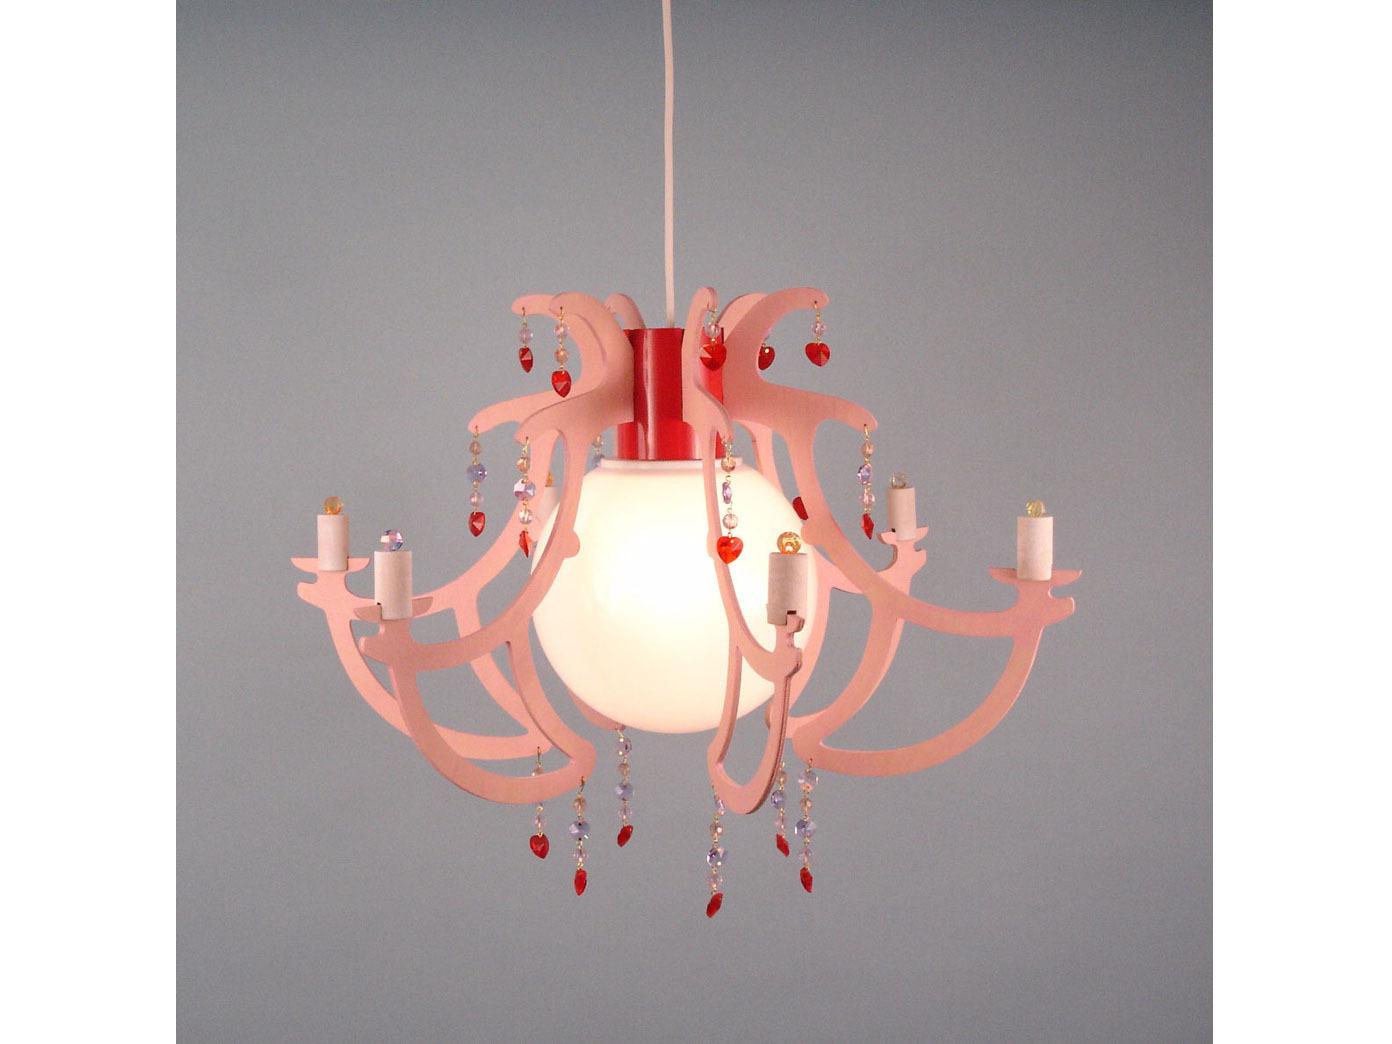 Ikea Kronleuchter Kinderzimmer ~ Kinder kronleuchter pendelleuchte lüster rosata romantische